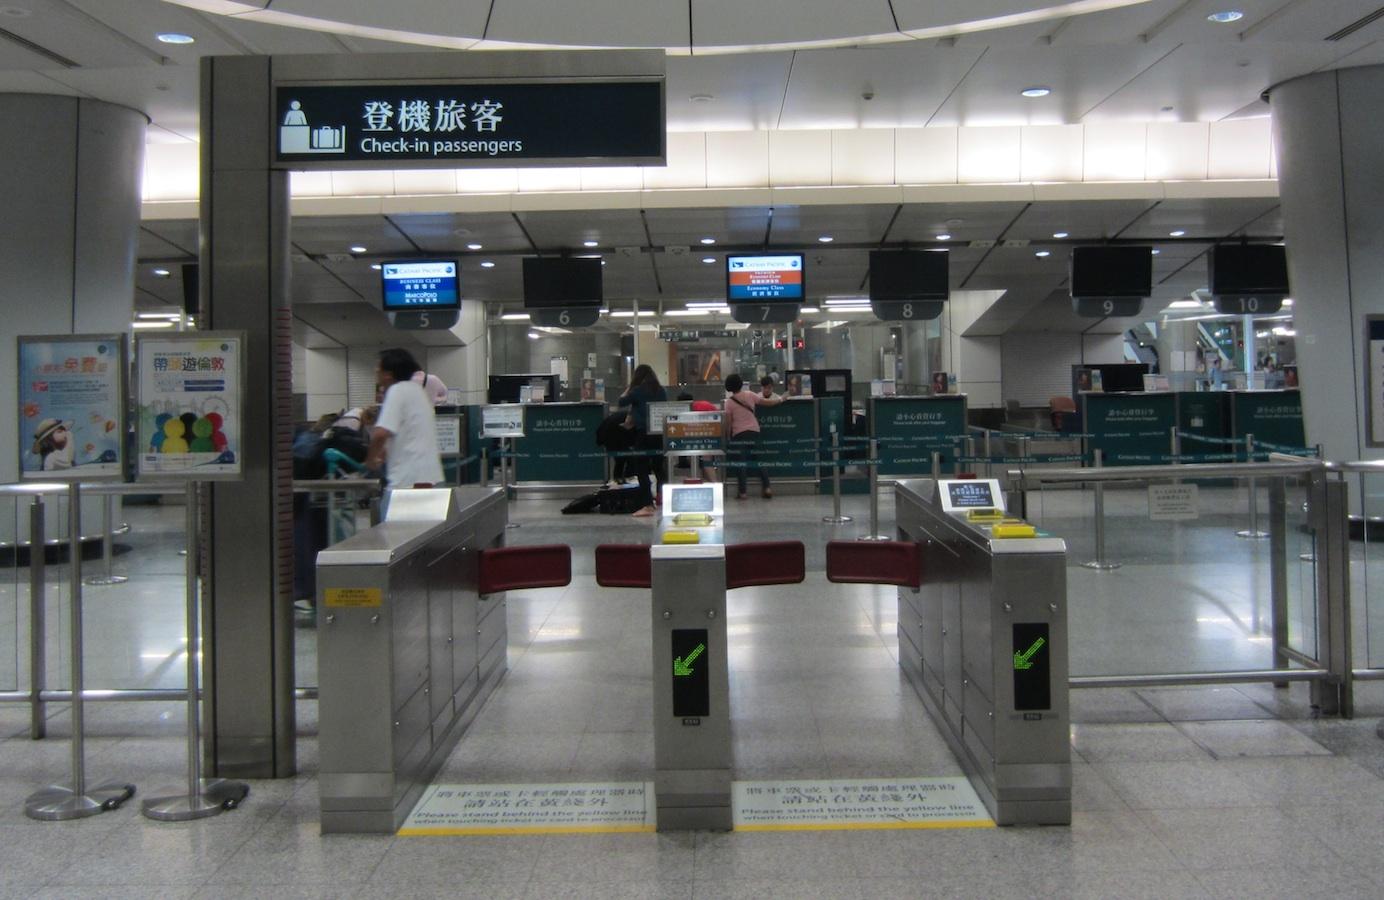 Kowloon checkin